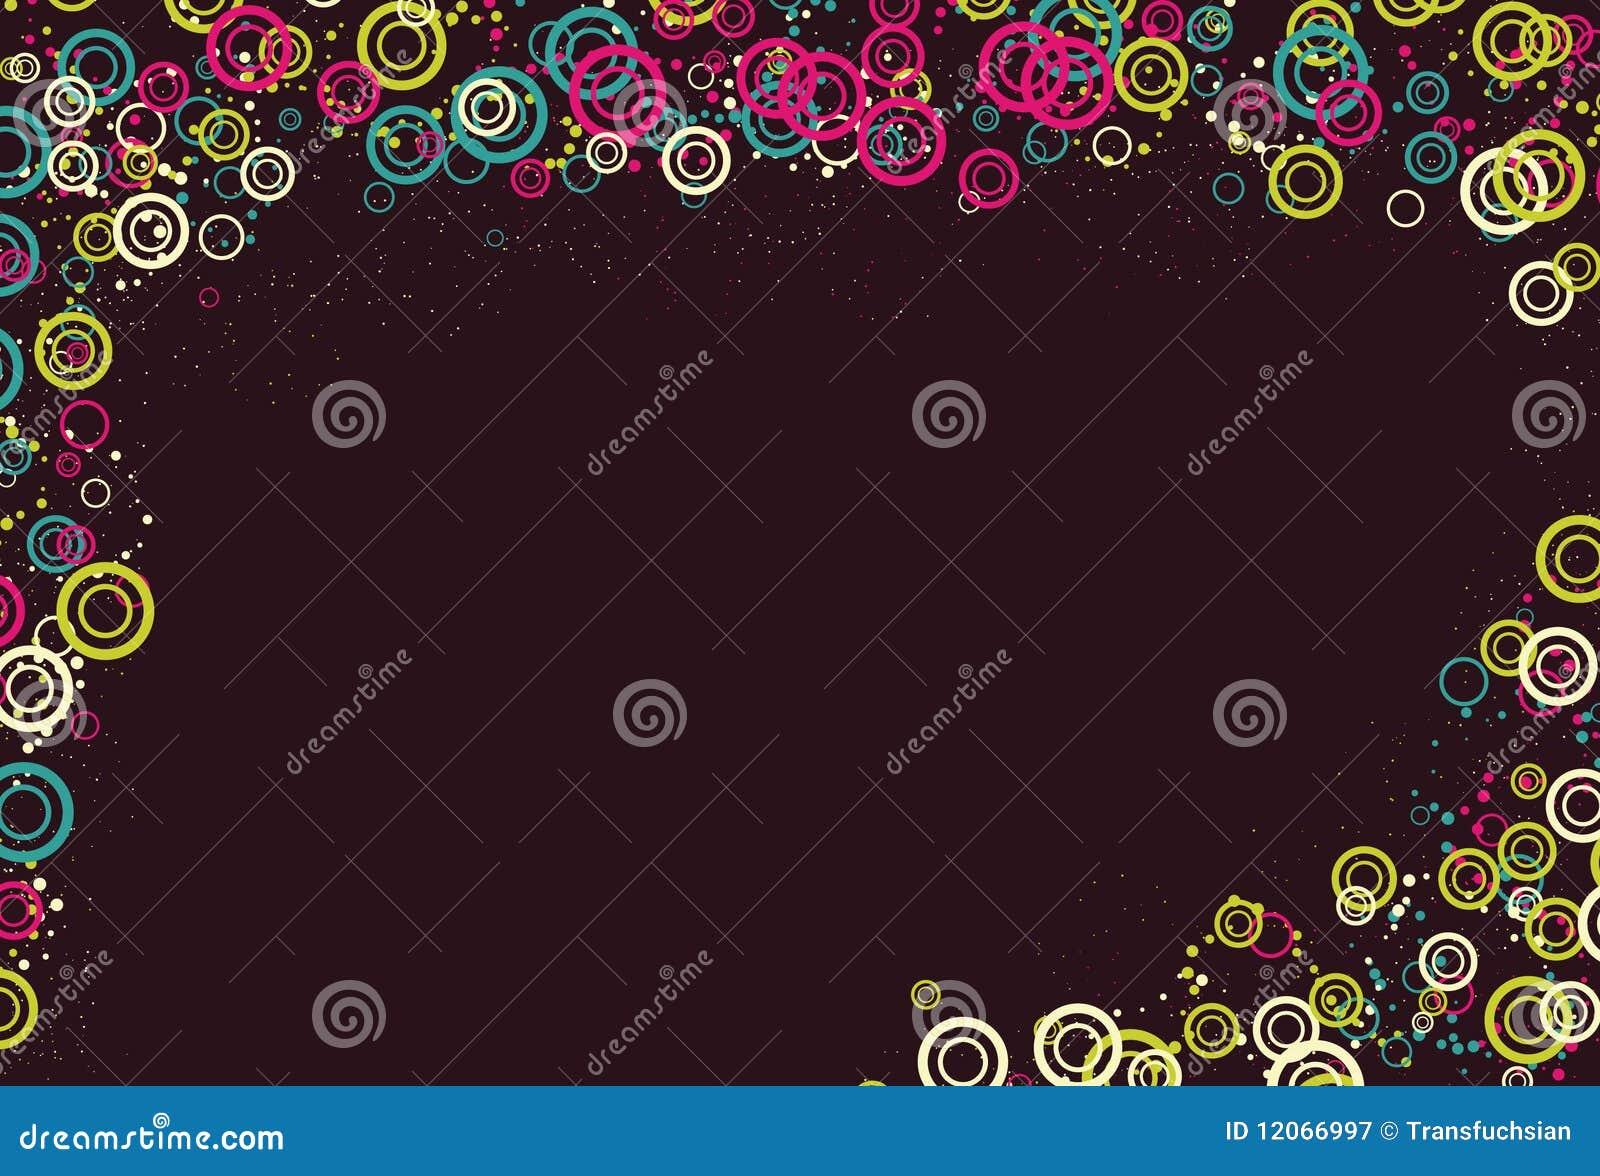 My Ganja Live Wallpaper ????????? - My Ganja Live Wallpaper 1.13 ...